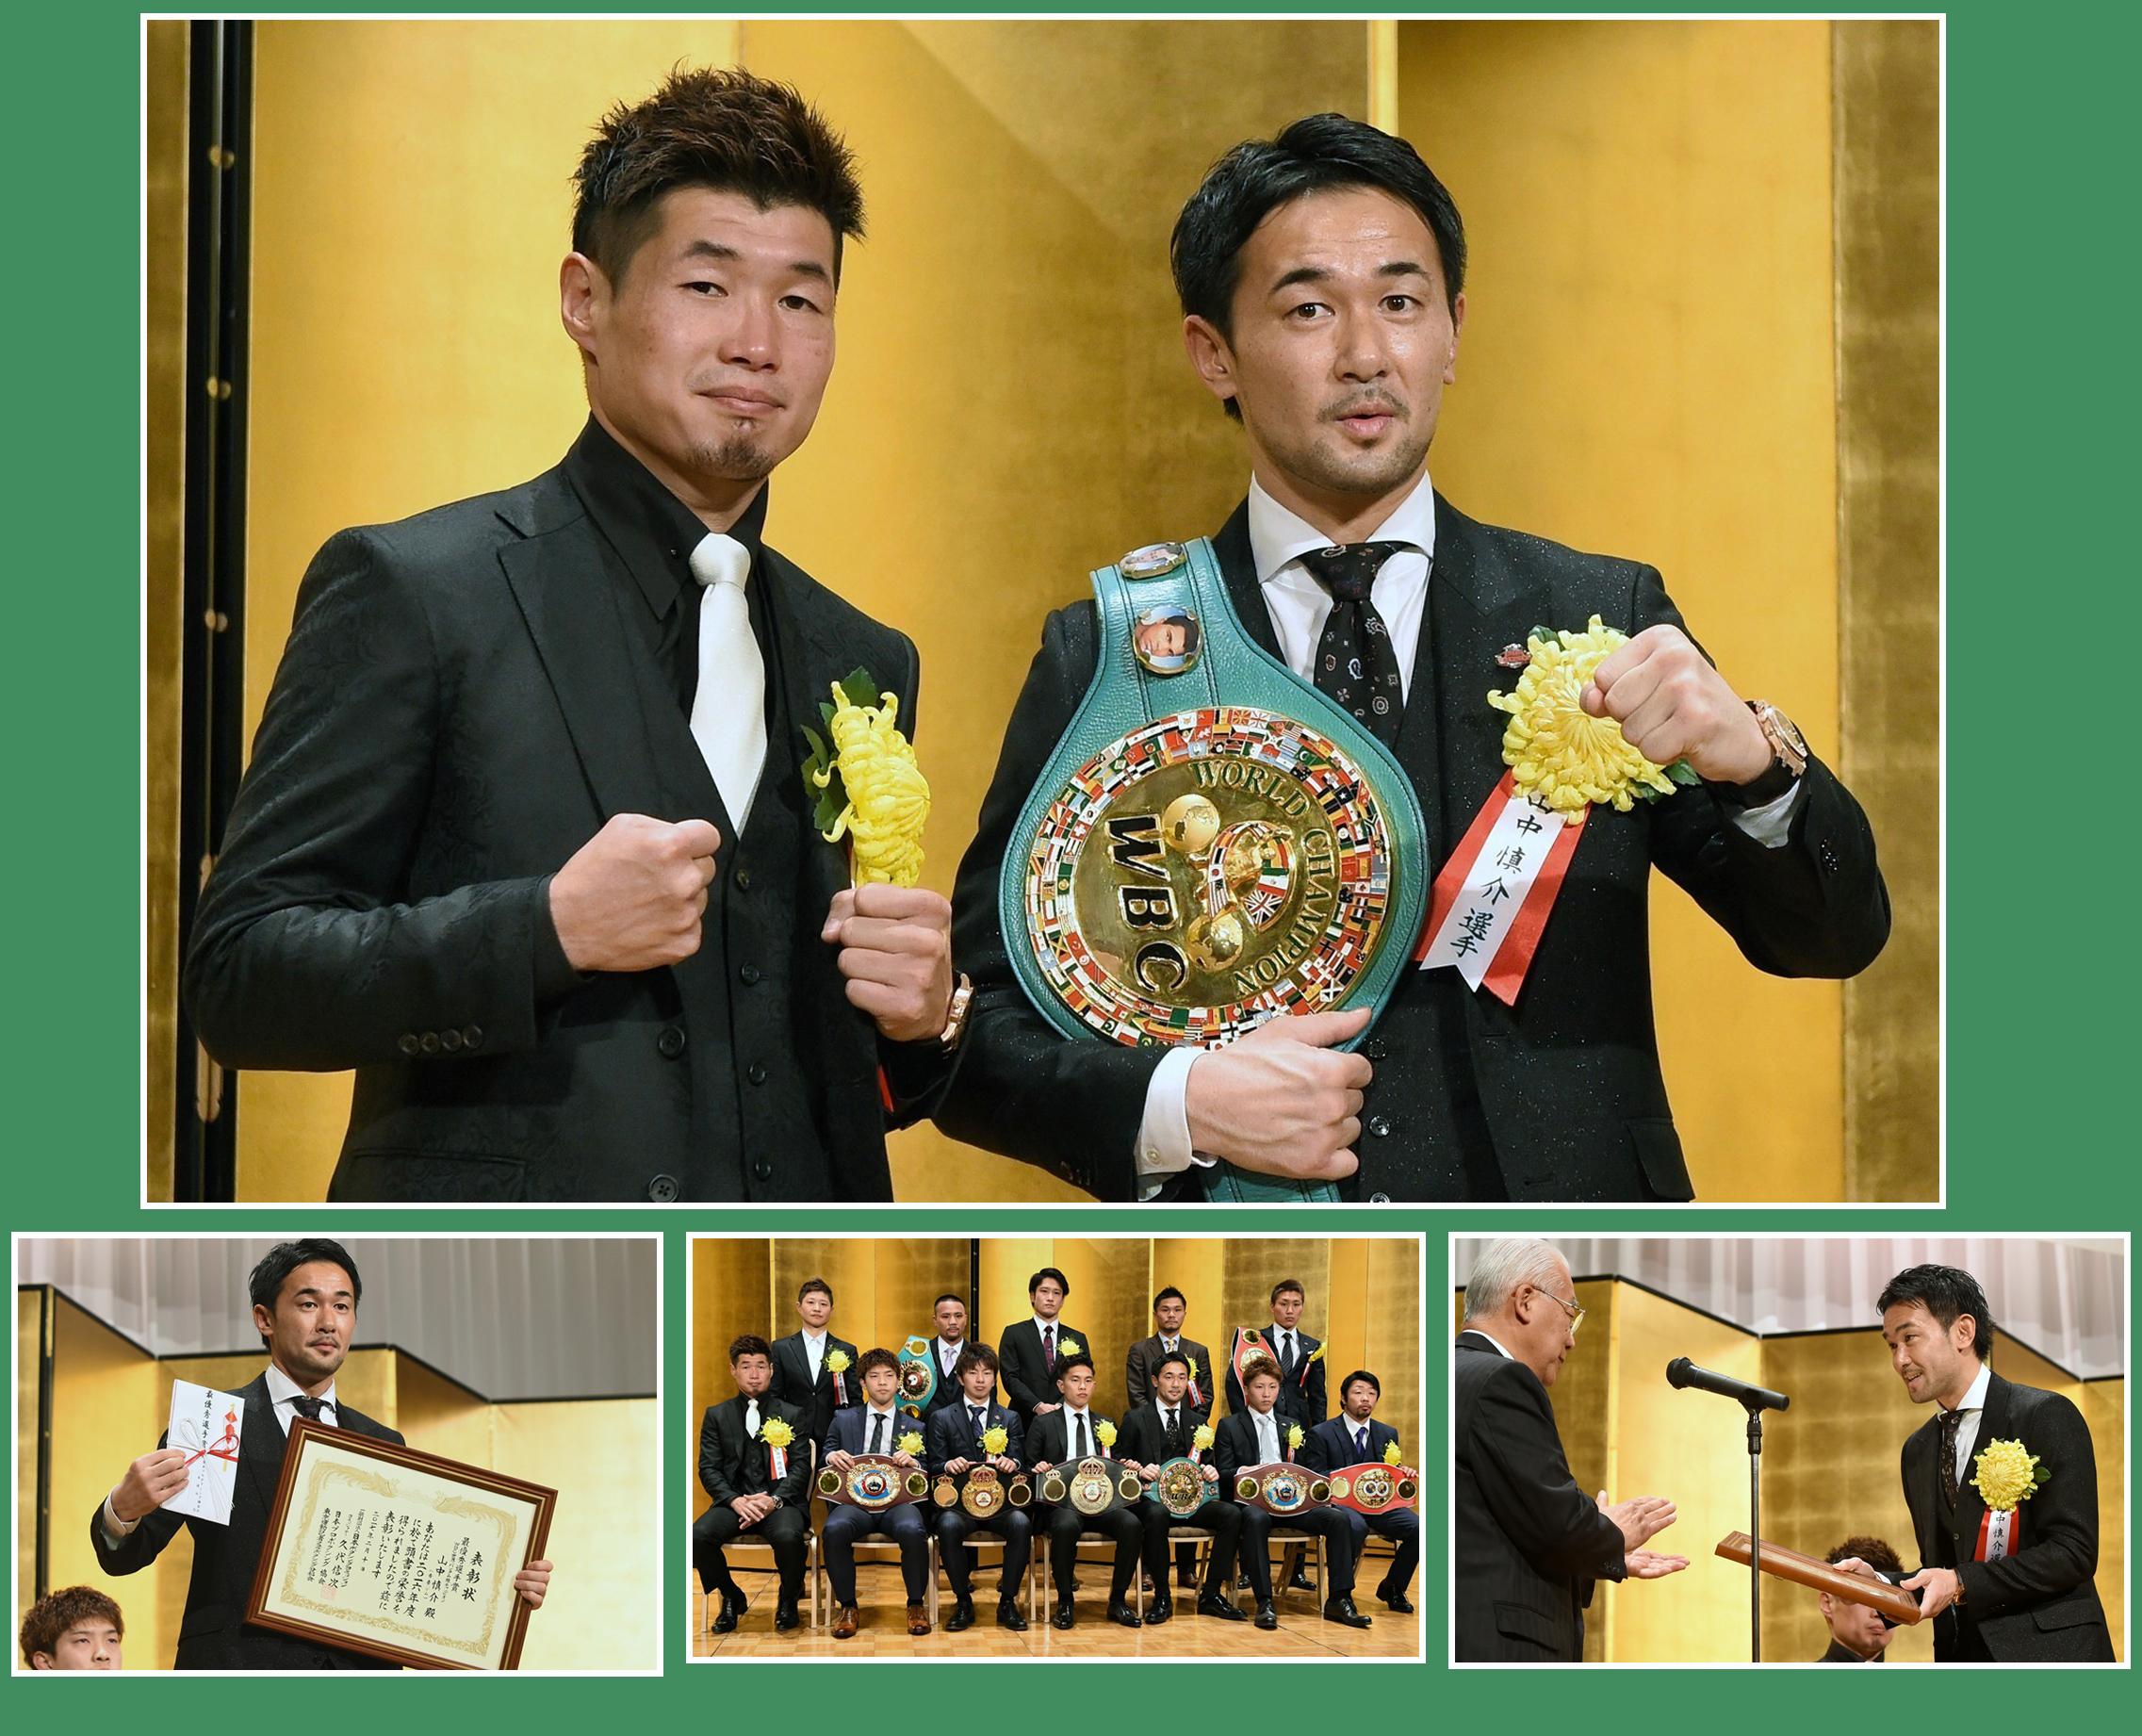 yamanaka-hazegawa-premios-2017